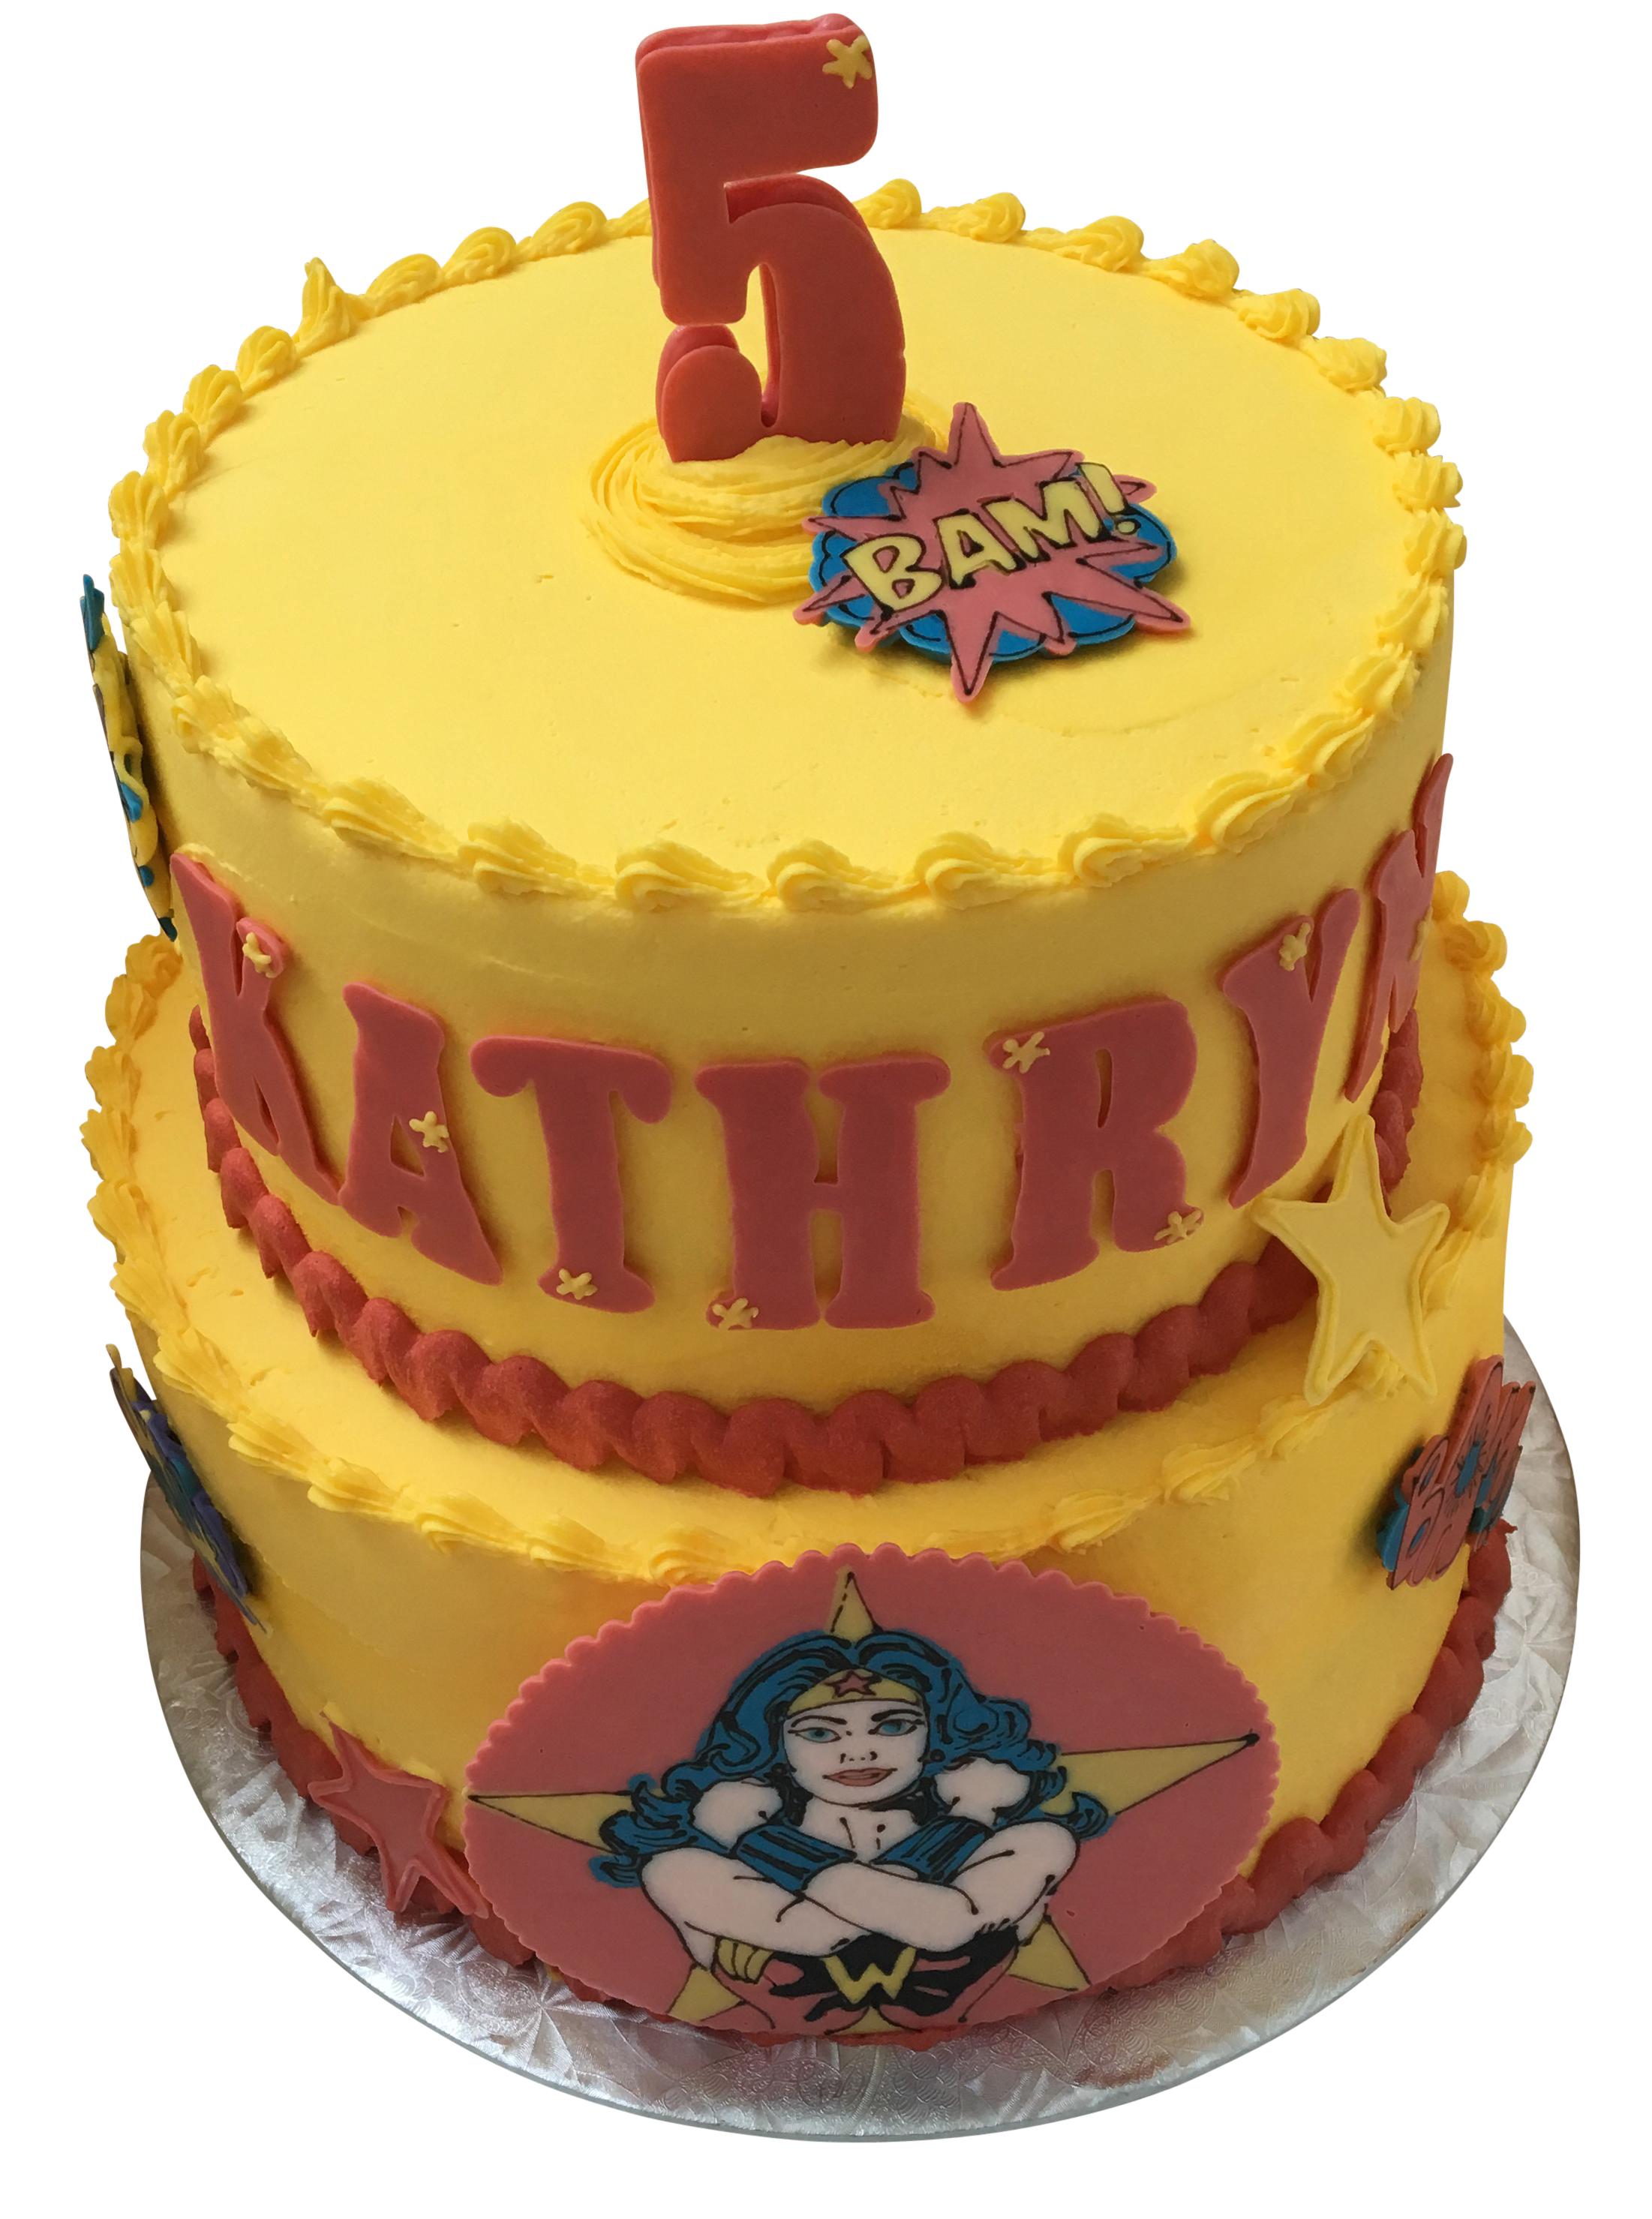 BeBe-Cakes-Superhero-Wonder-Woman!-Cake.jpg